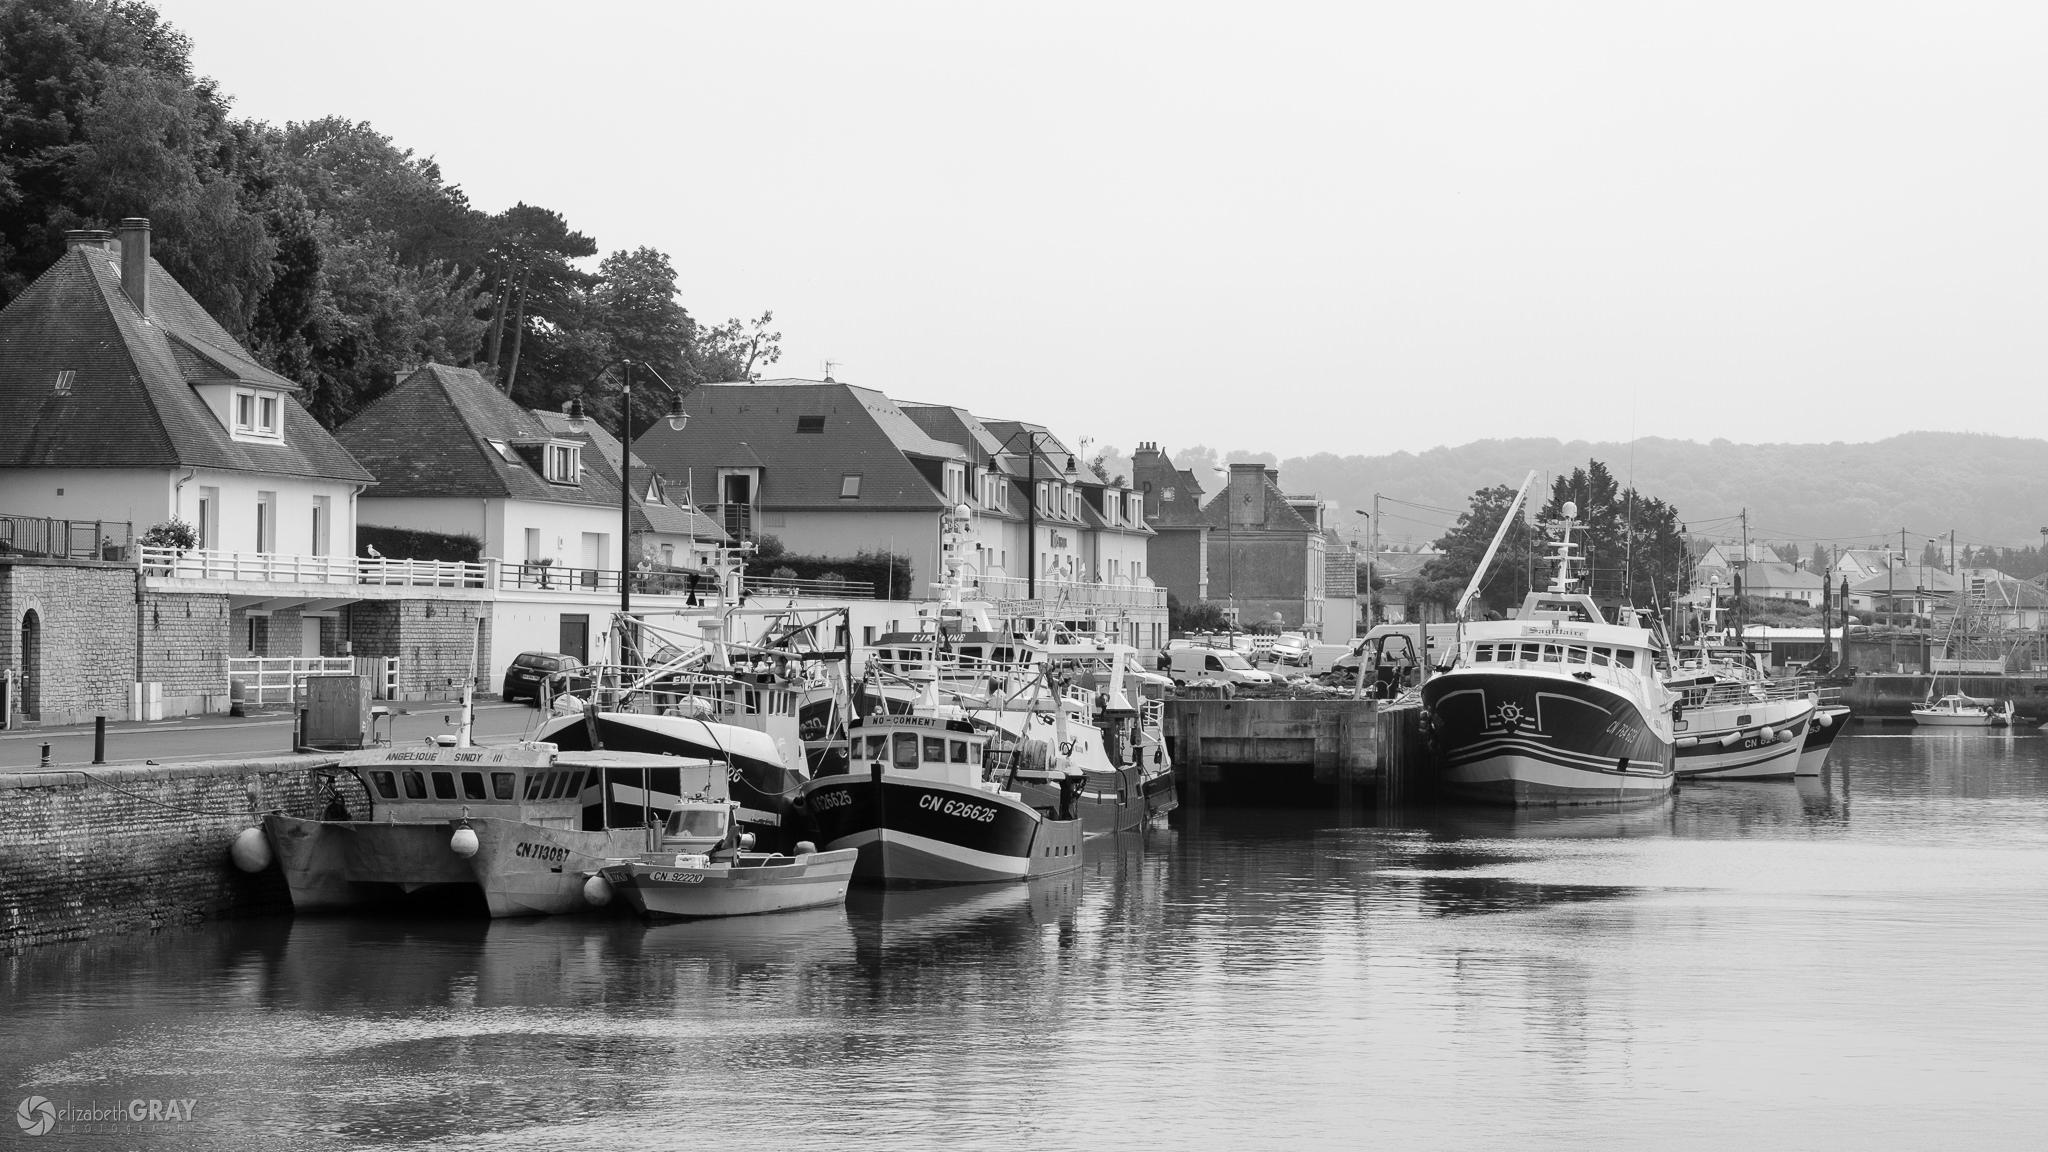 Port en Bessin Boats